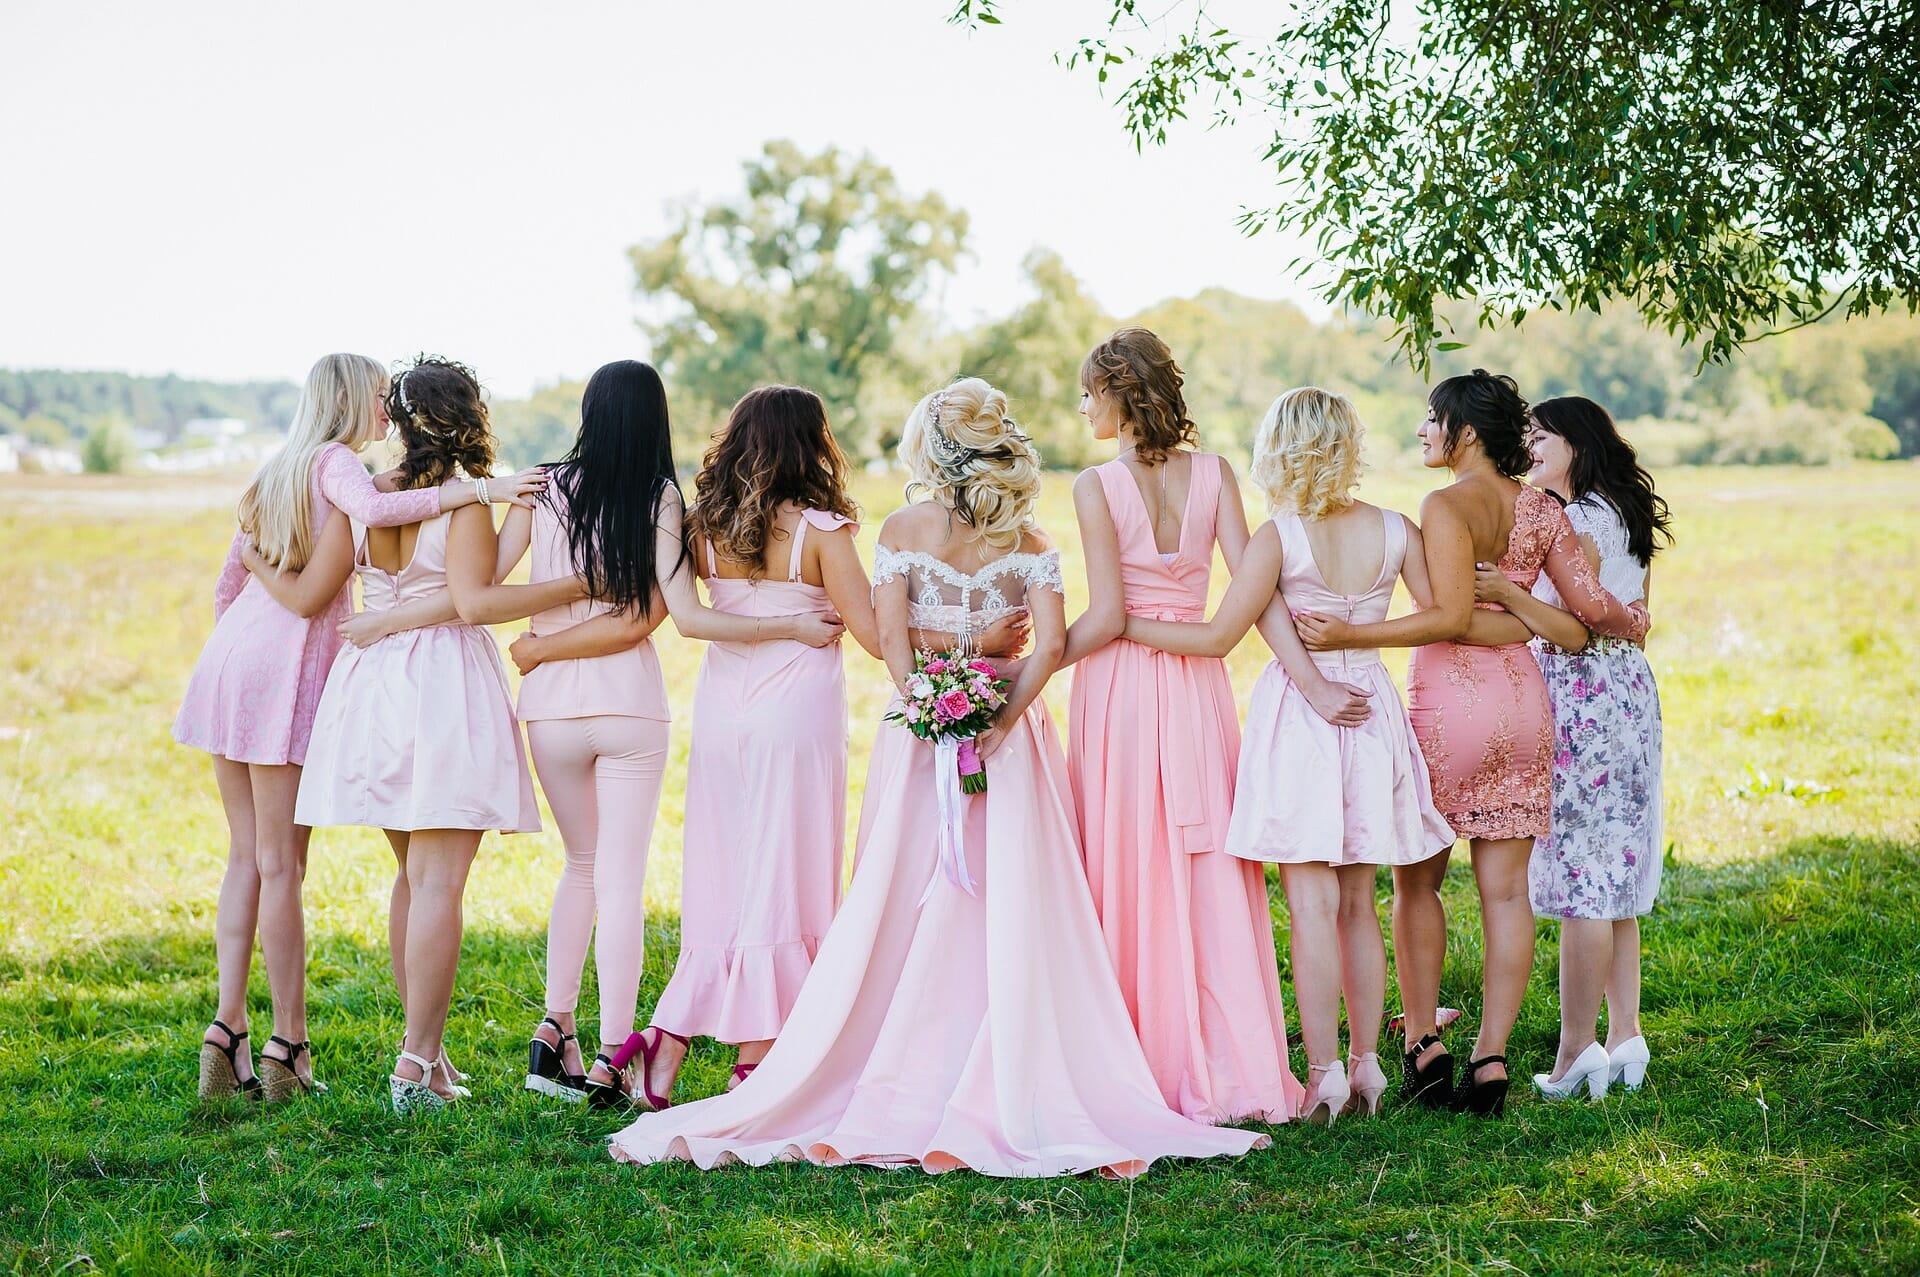 Bride & Bridesmaids - Horizontal